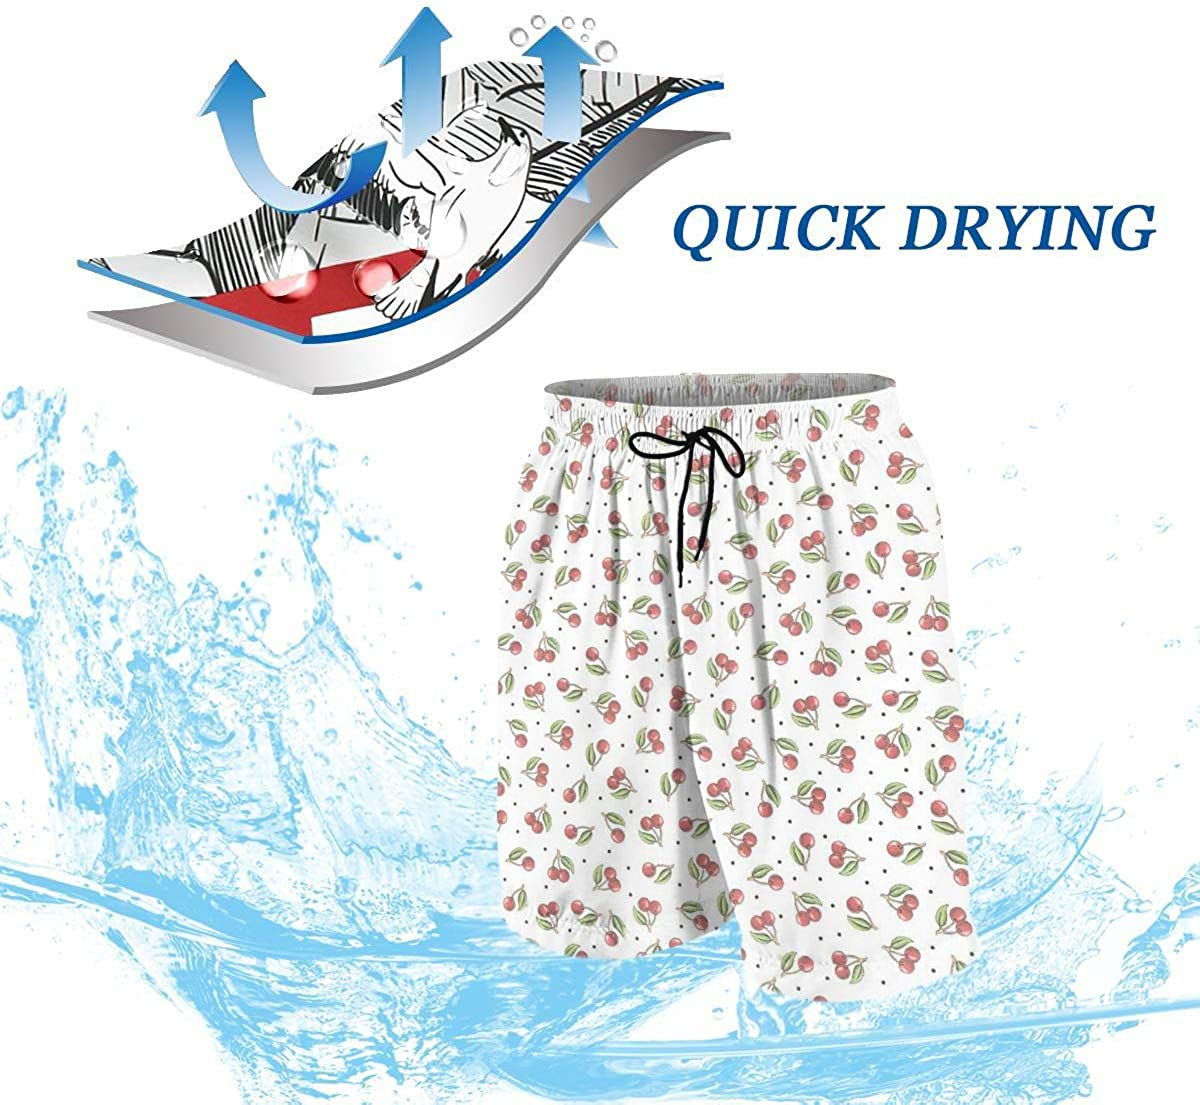 Kidhome Teenagers Boys Beach Board Shorts Small Cherry Summer Drawstring Beach Shorts Swim Trunks with Pockets for Teen Boys